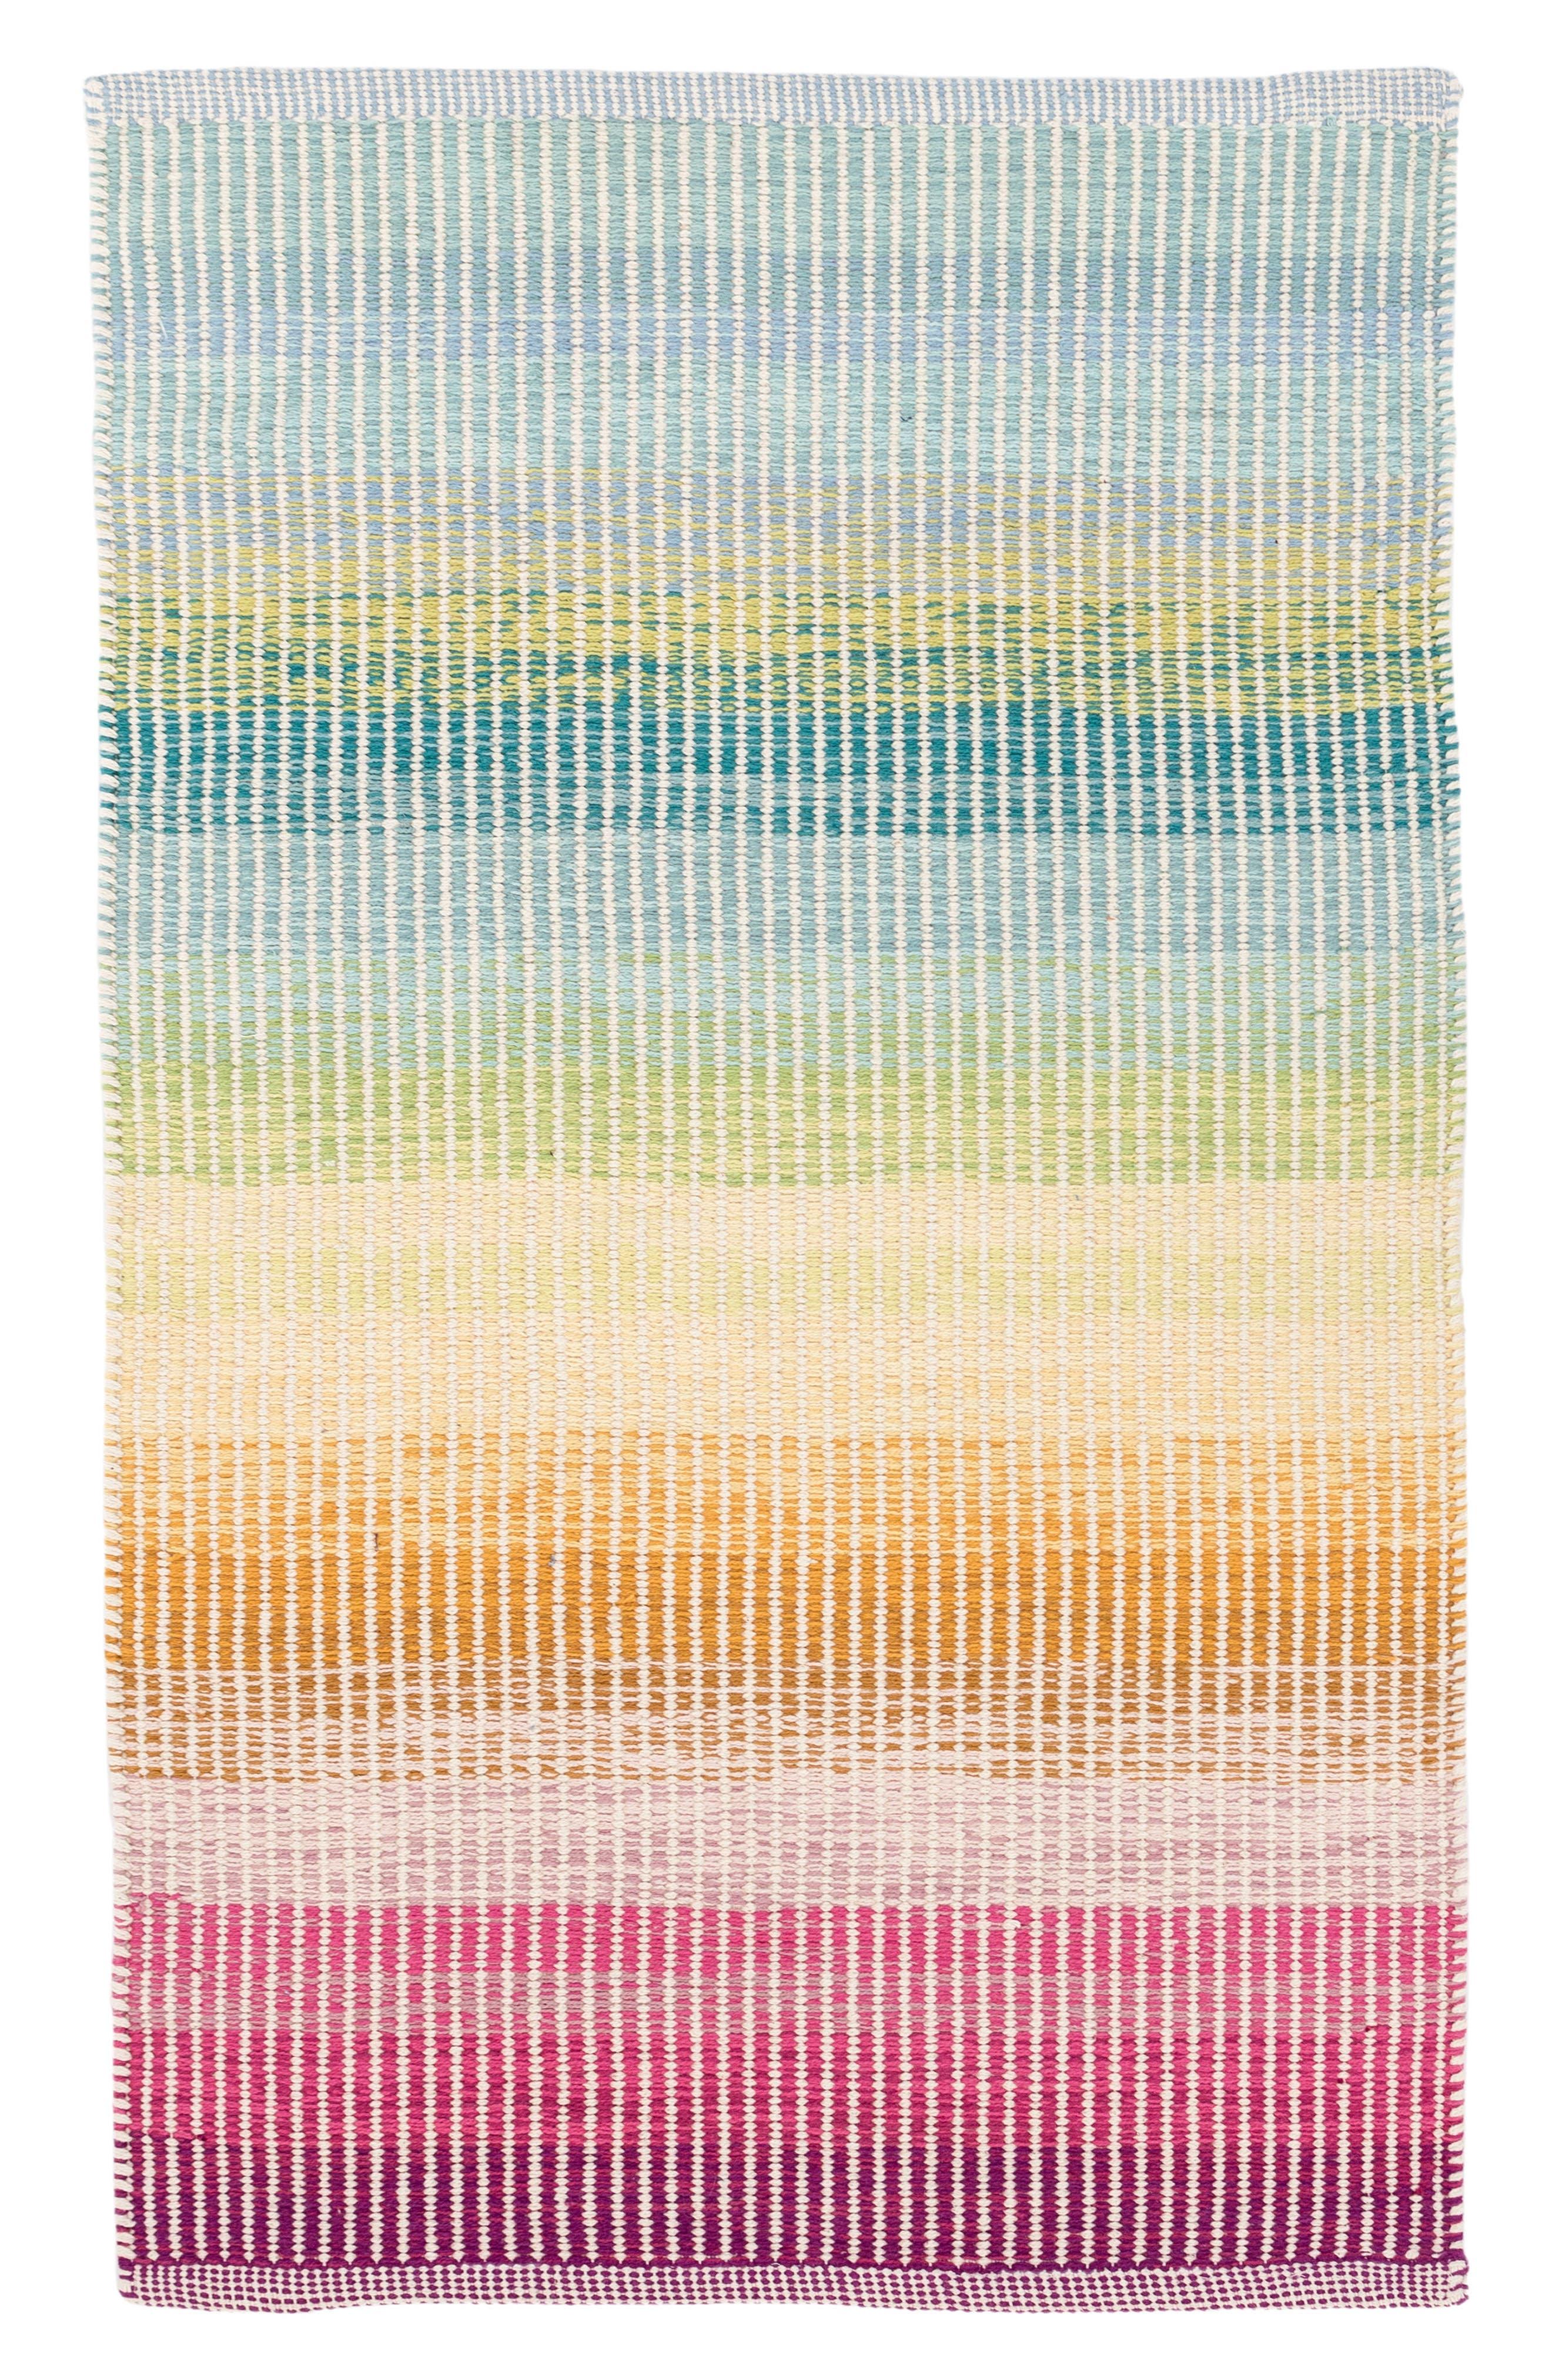 Alternate Image 1 Selected - Dash & Albert Watercolor Horizon Handwoven Cotton Rug